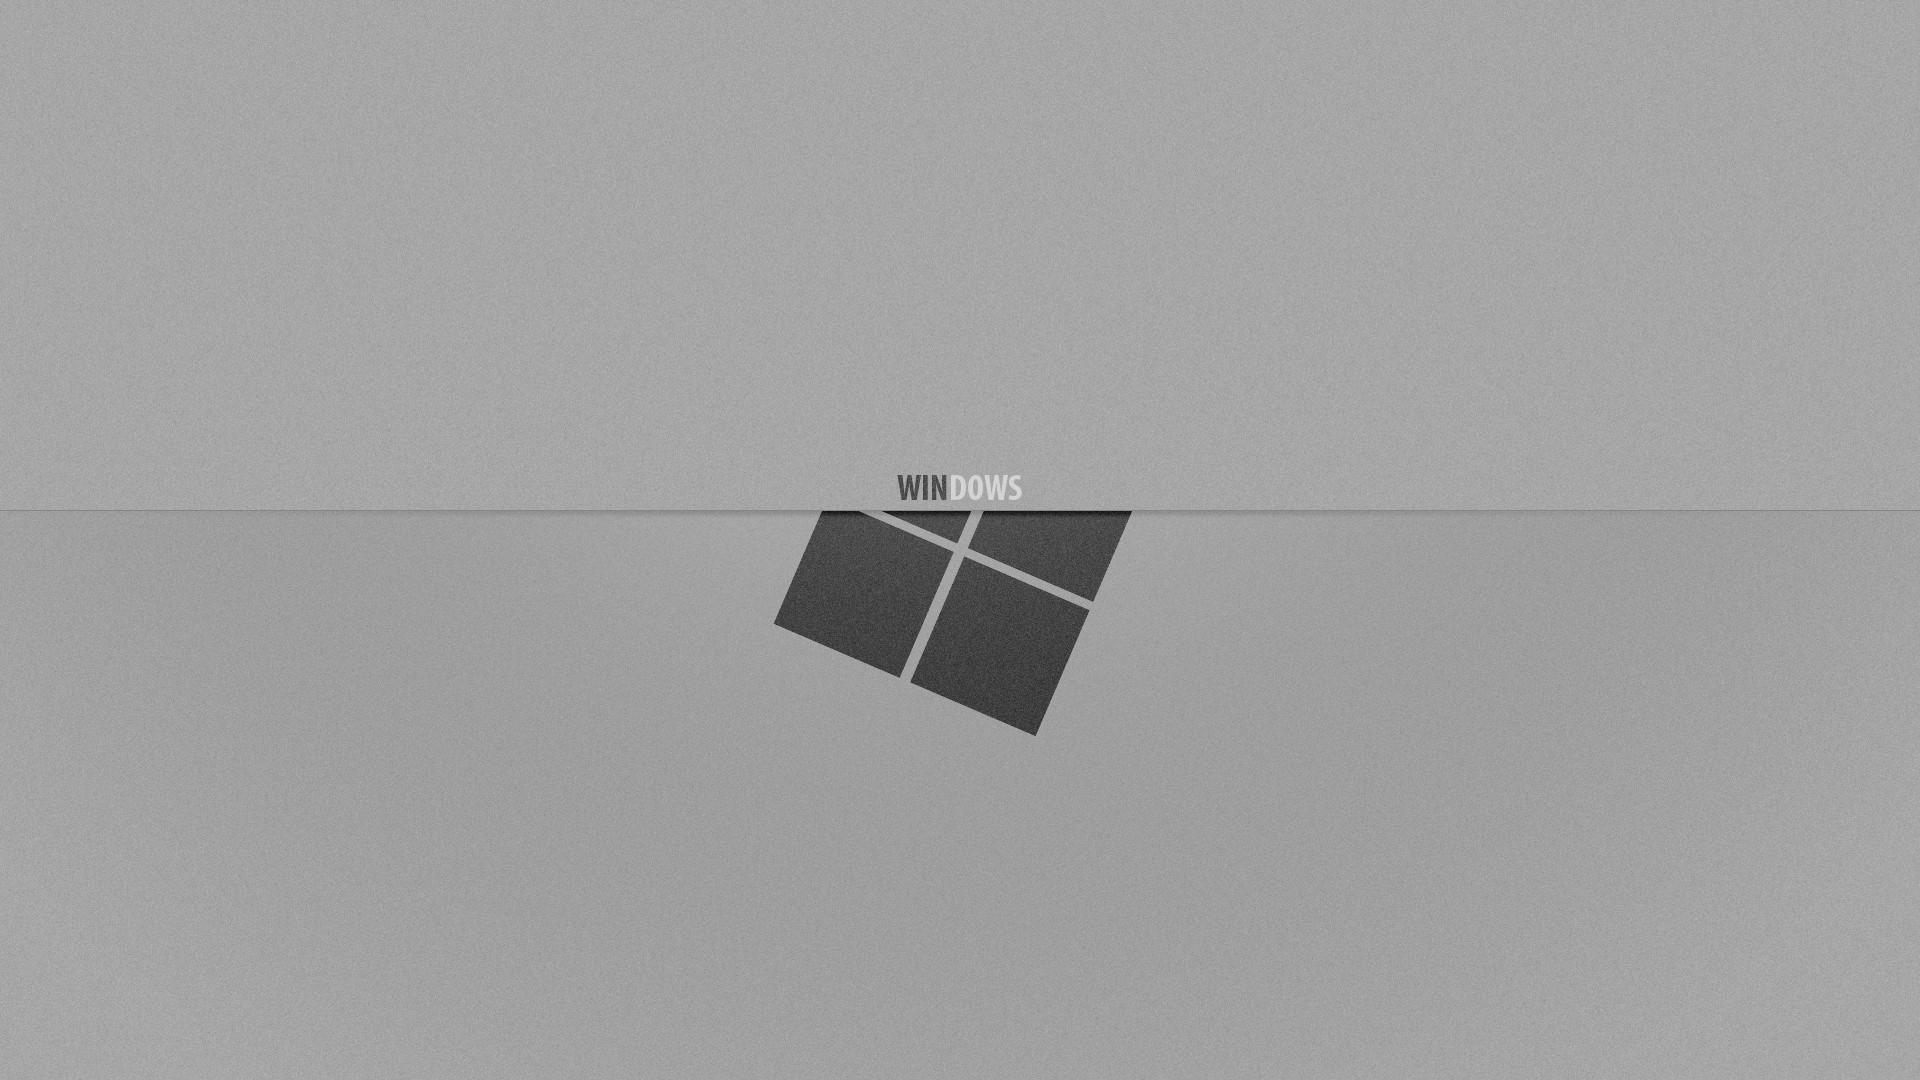 microsoft word for windows